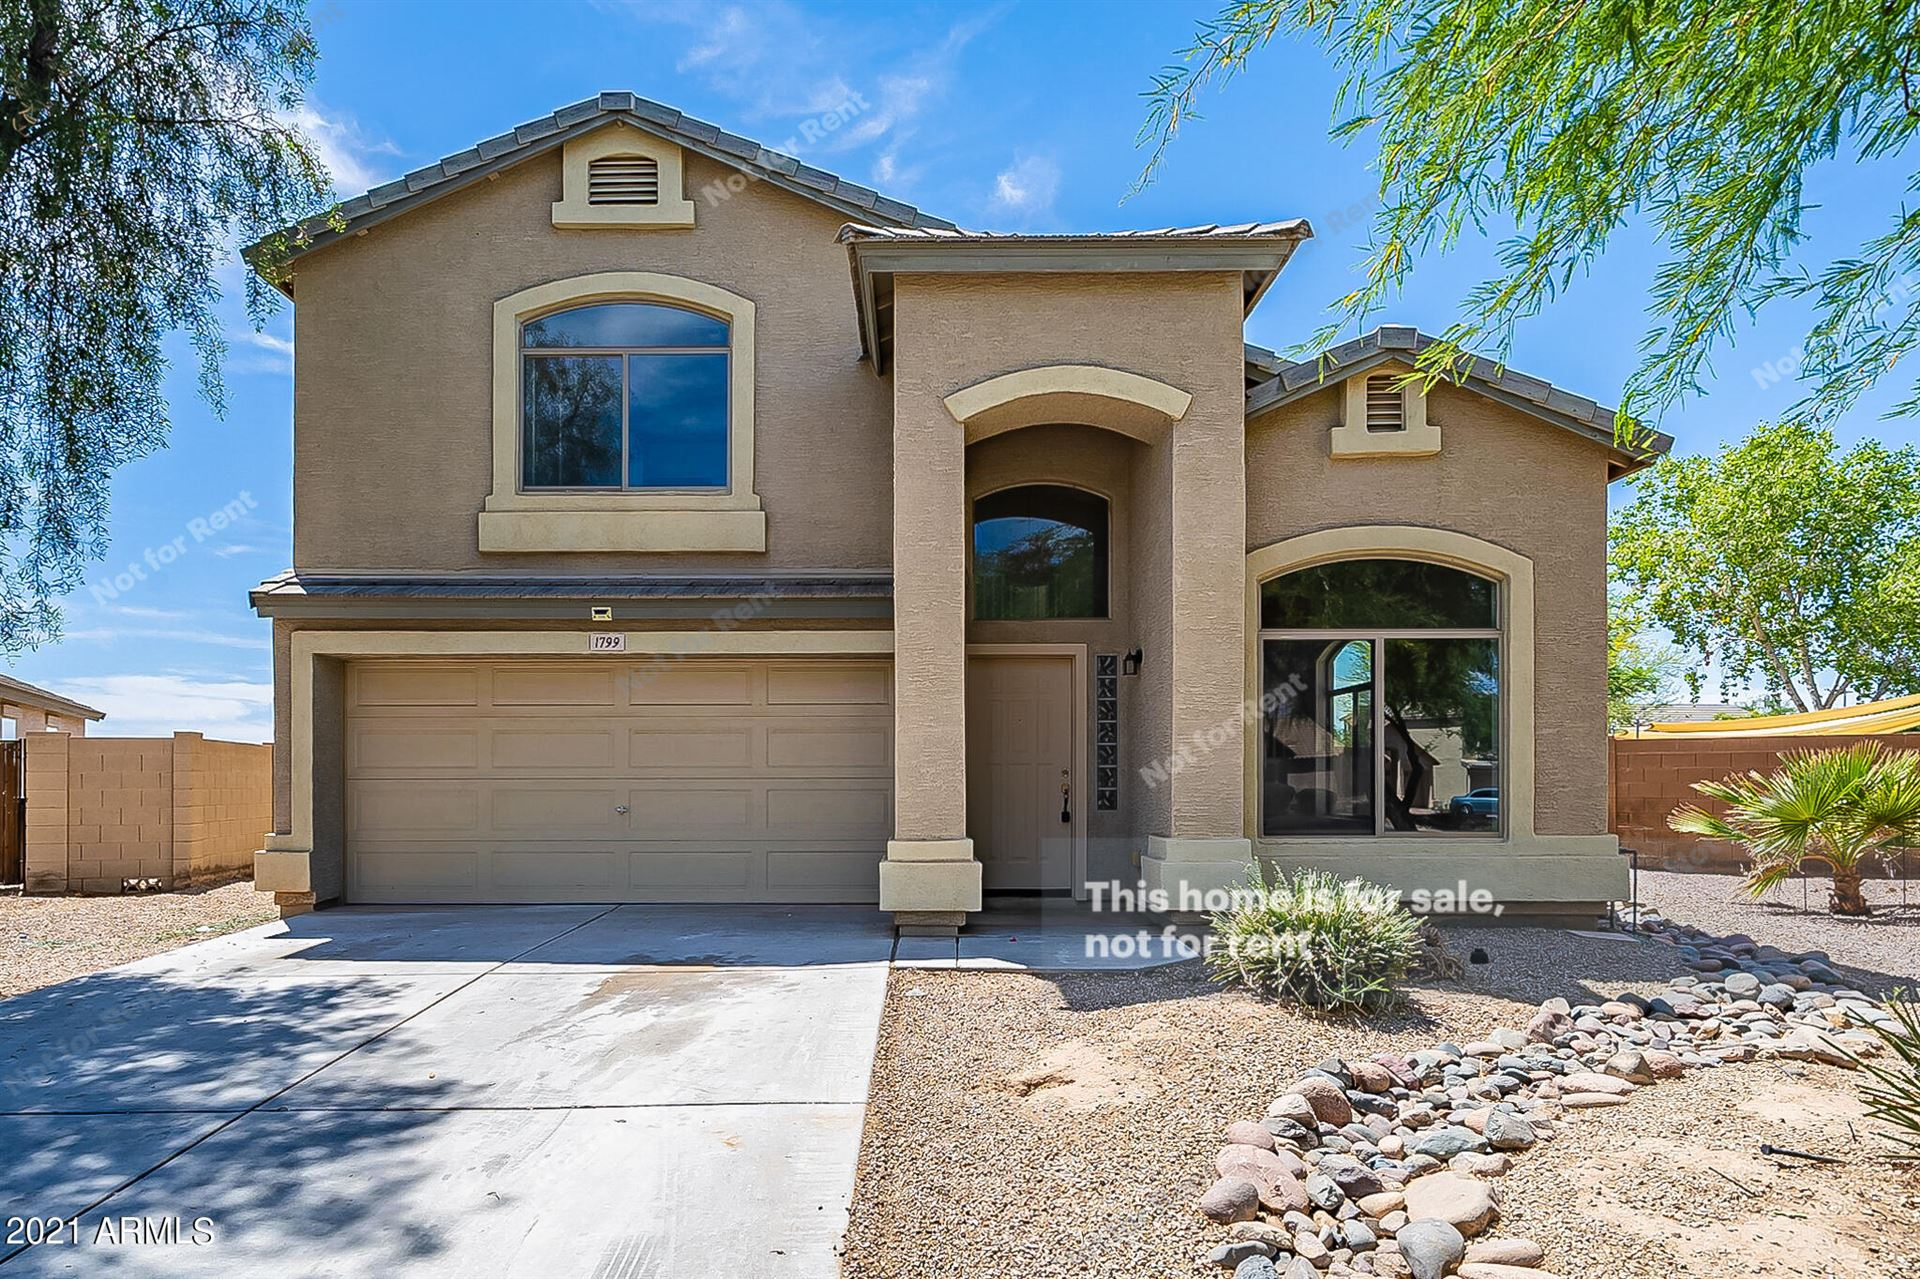 Photo of 1799 E KELSI Avenue, San Tan Valley, AZ 85140 (MLS # 6249679)